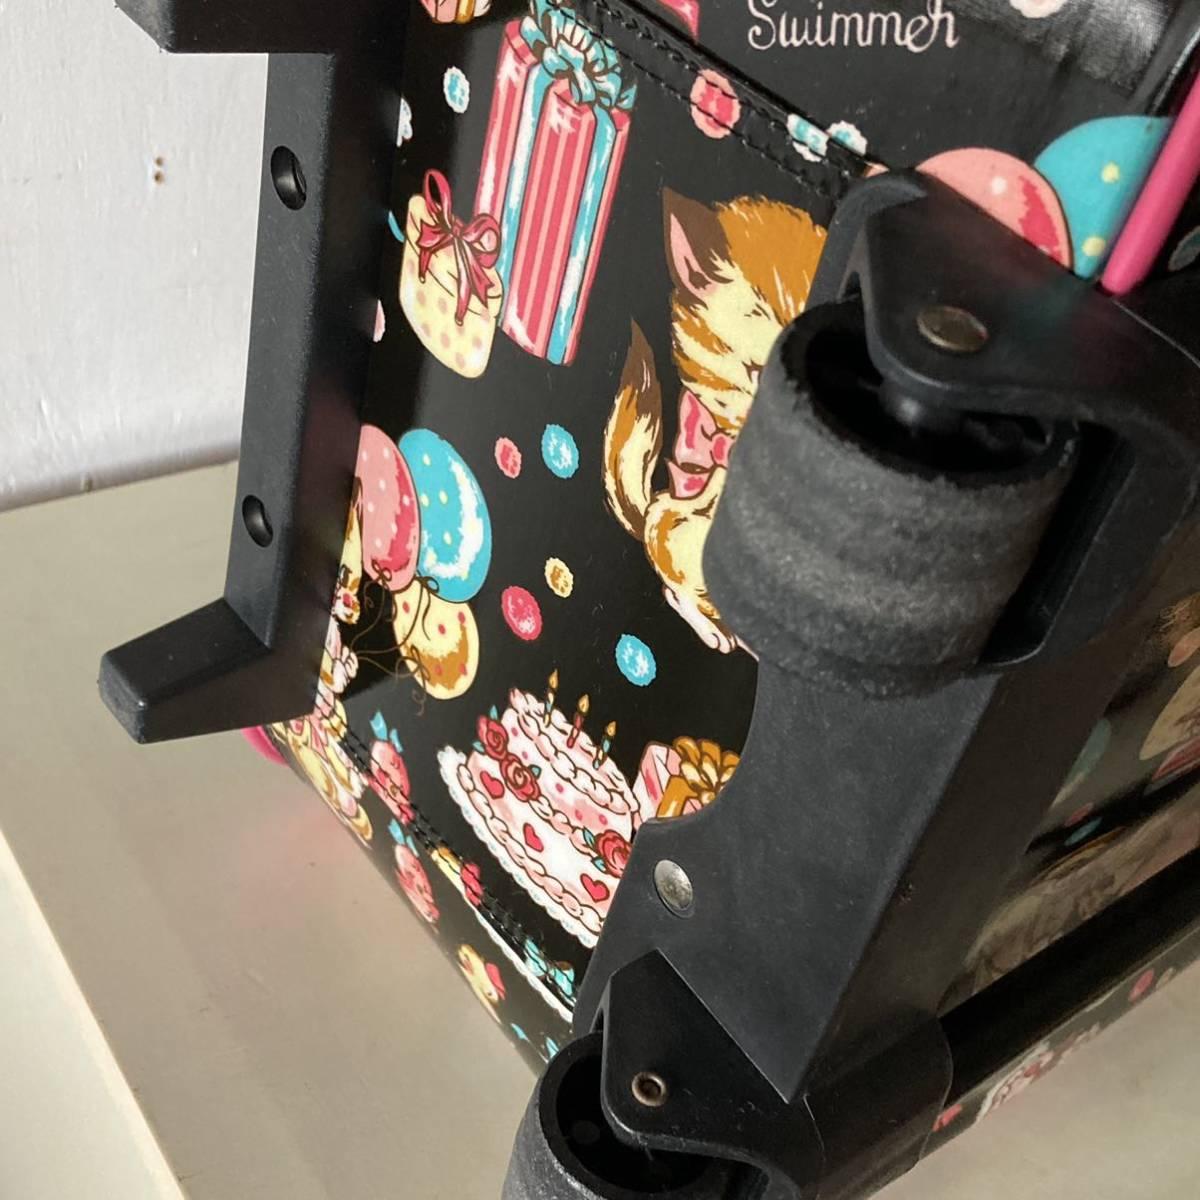 SWIMMER キャリーバッグ スイマー トランク スーツケース トラベル 旅行カバン _画像10